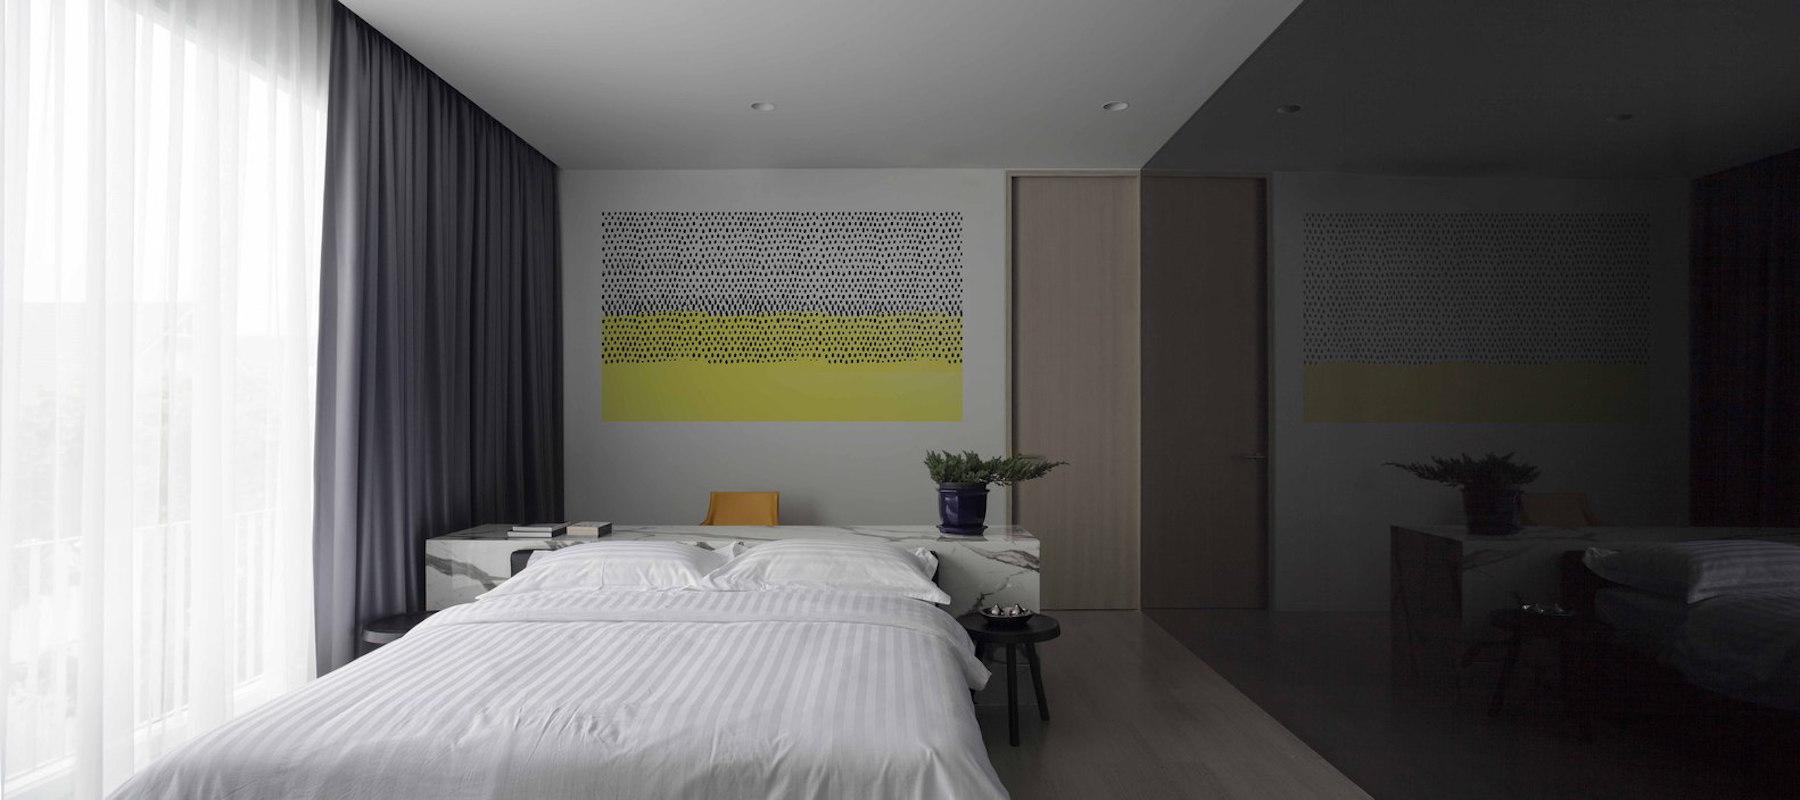 iGNANT-Architecture-Ayutt-And-Associates-Design-White-Box-House-06